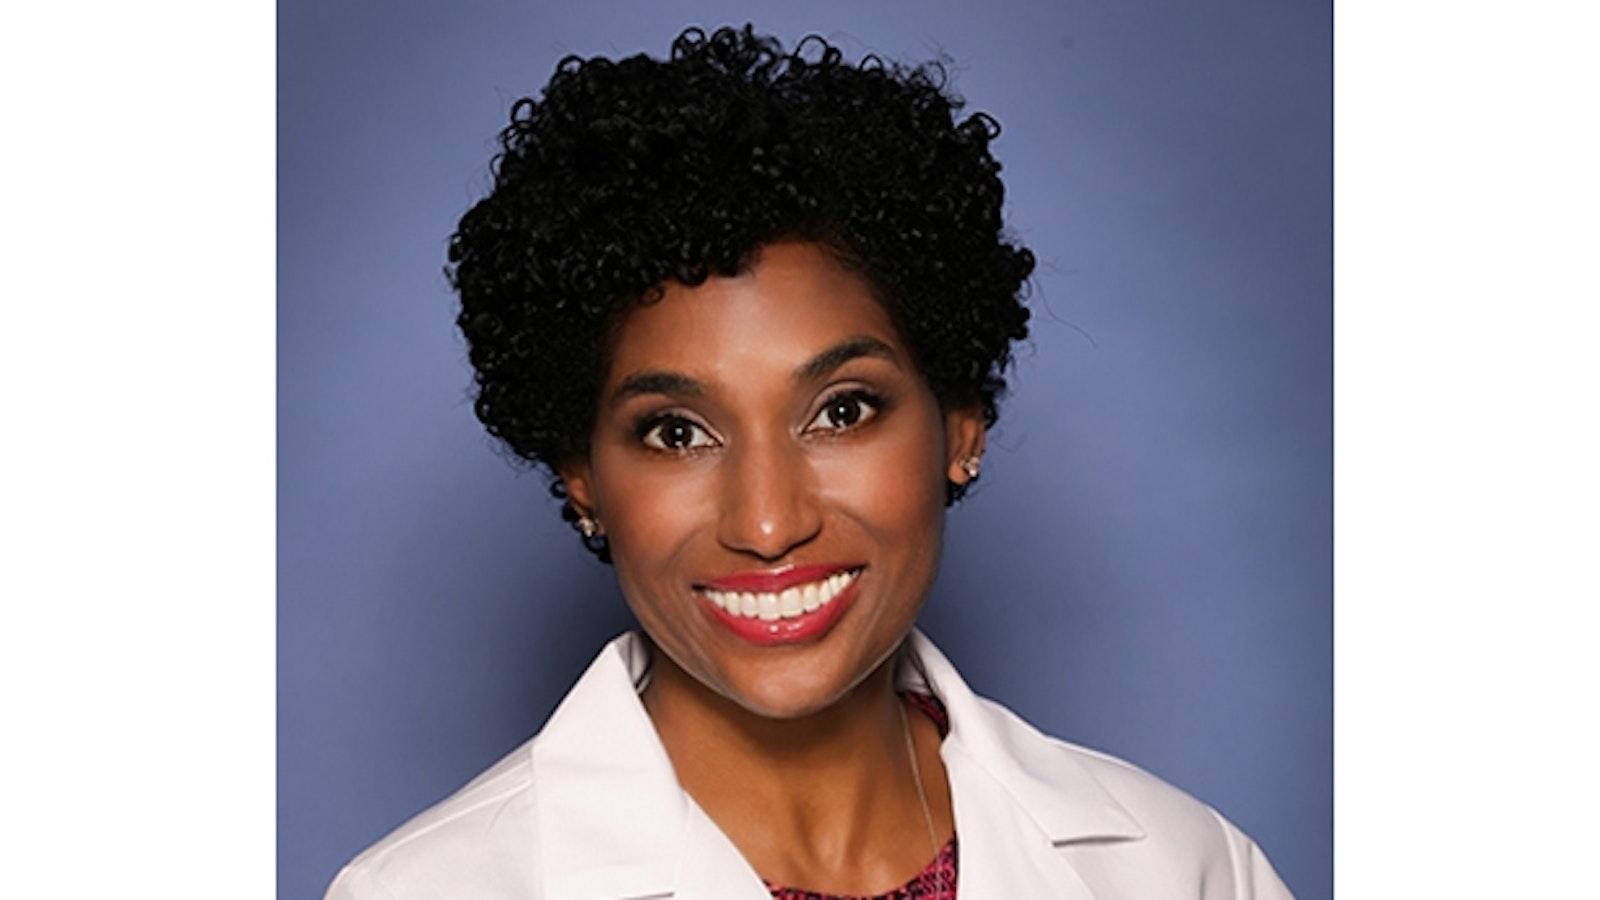 DR SONIA EDEN DMC neurosurgery i